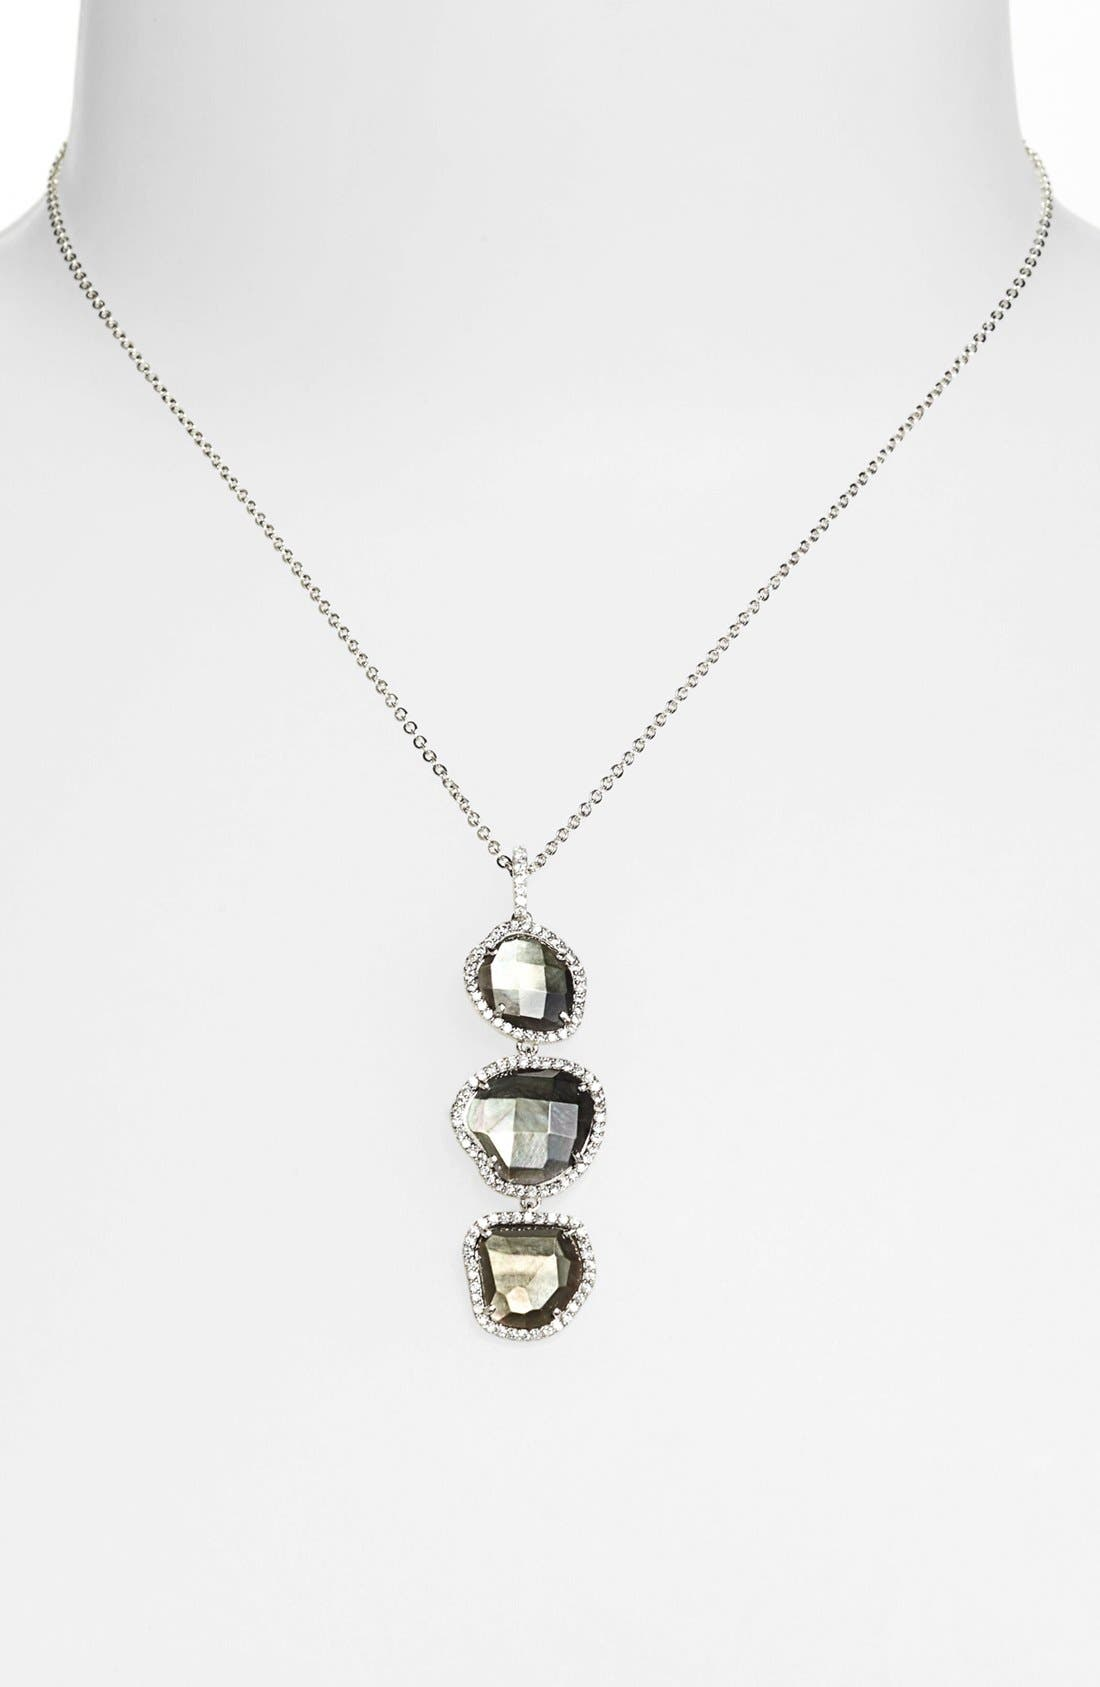 Alternate Image 1 Selected - Nadri Pendant Necklace (Nordstrom Exclusive)